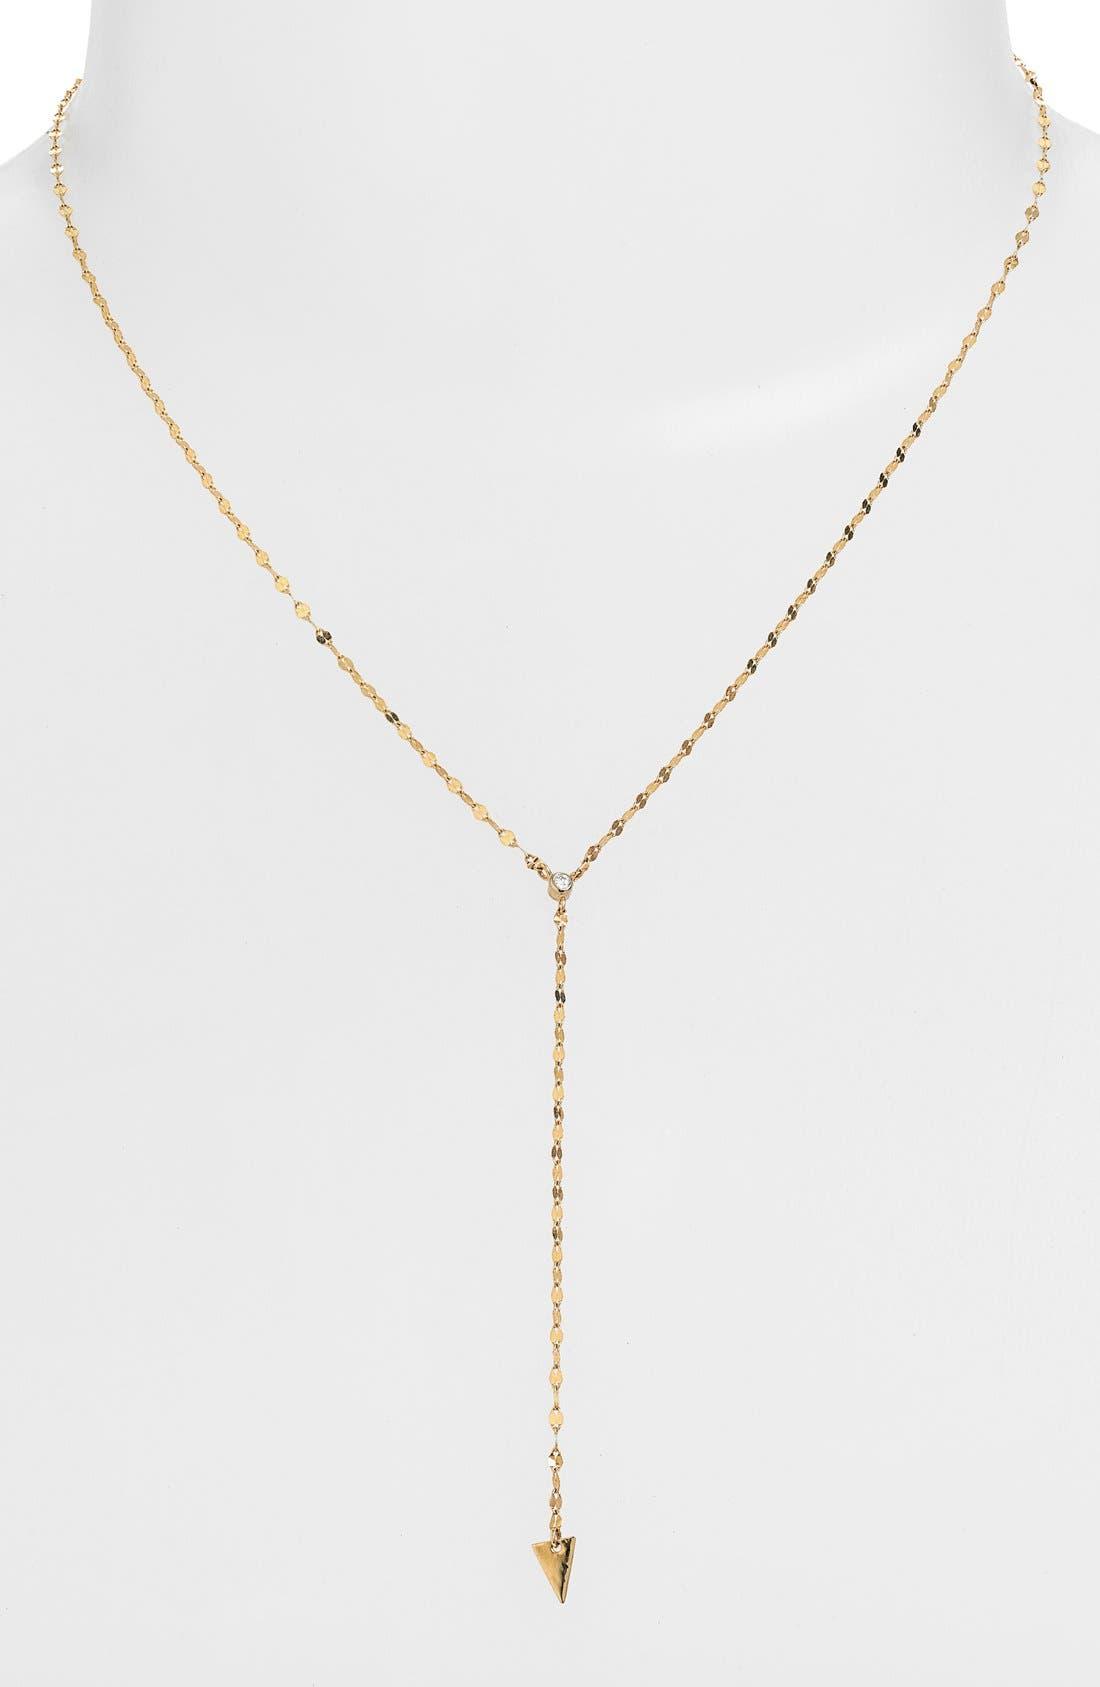 Alternate Image 1 Selected - Lana Jewelry 'Triangle' Diamond Y-Necklace